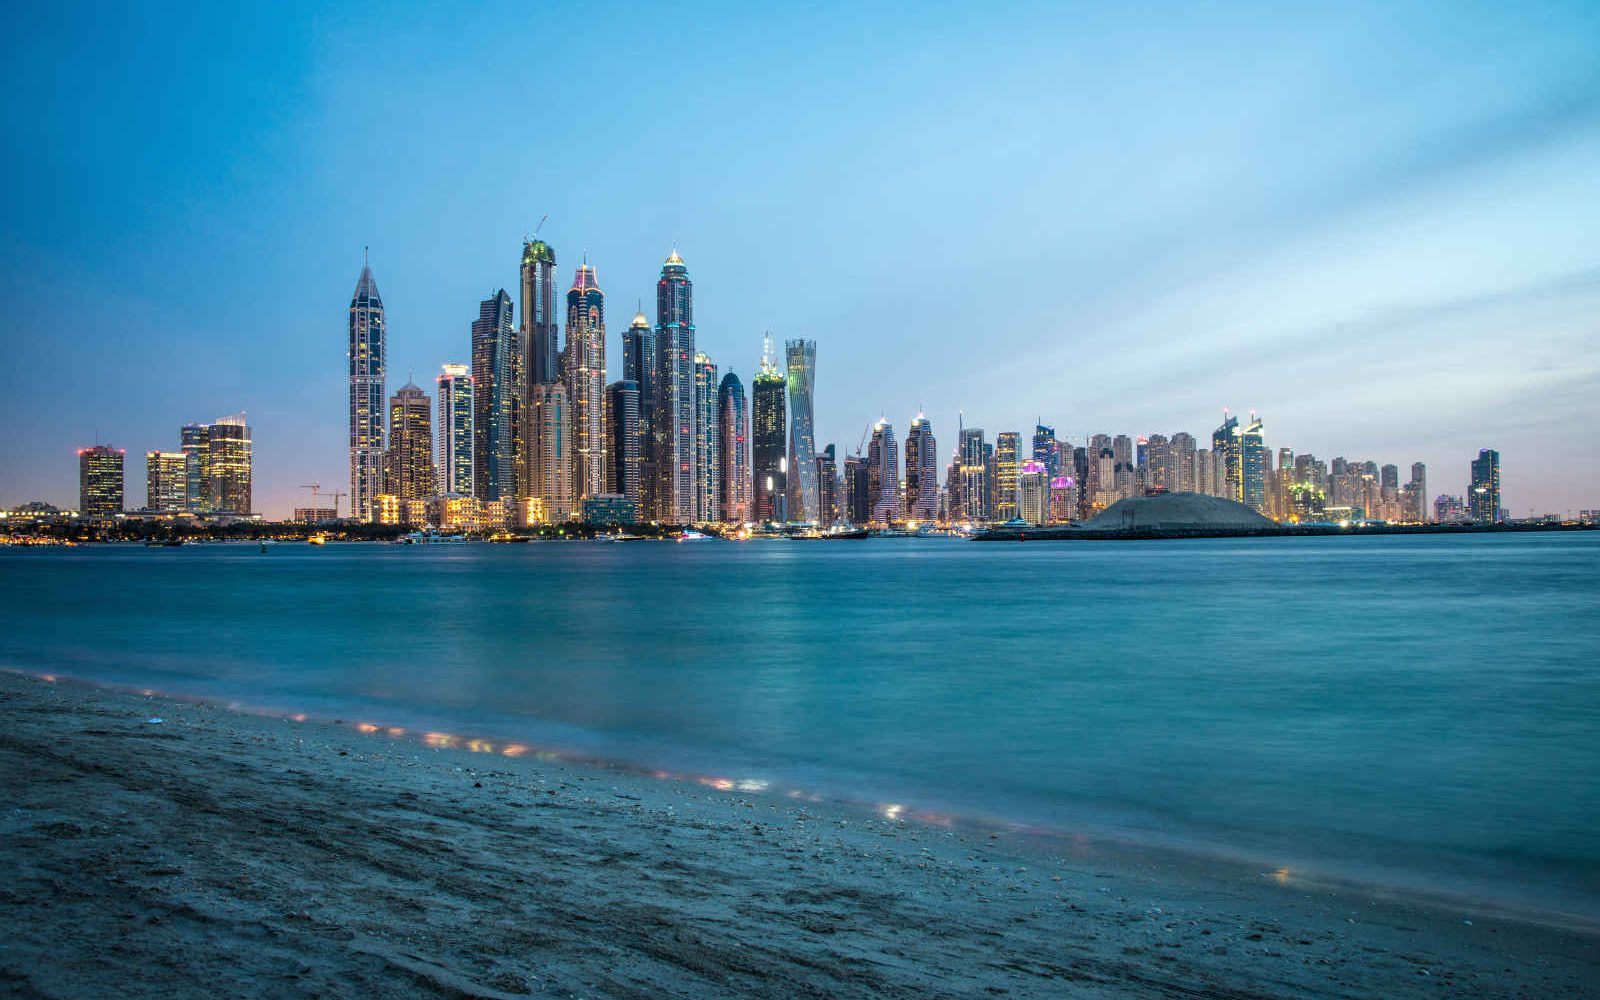 Skyline, Marina, Dubai